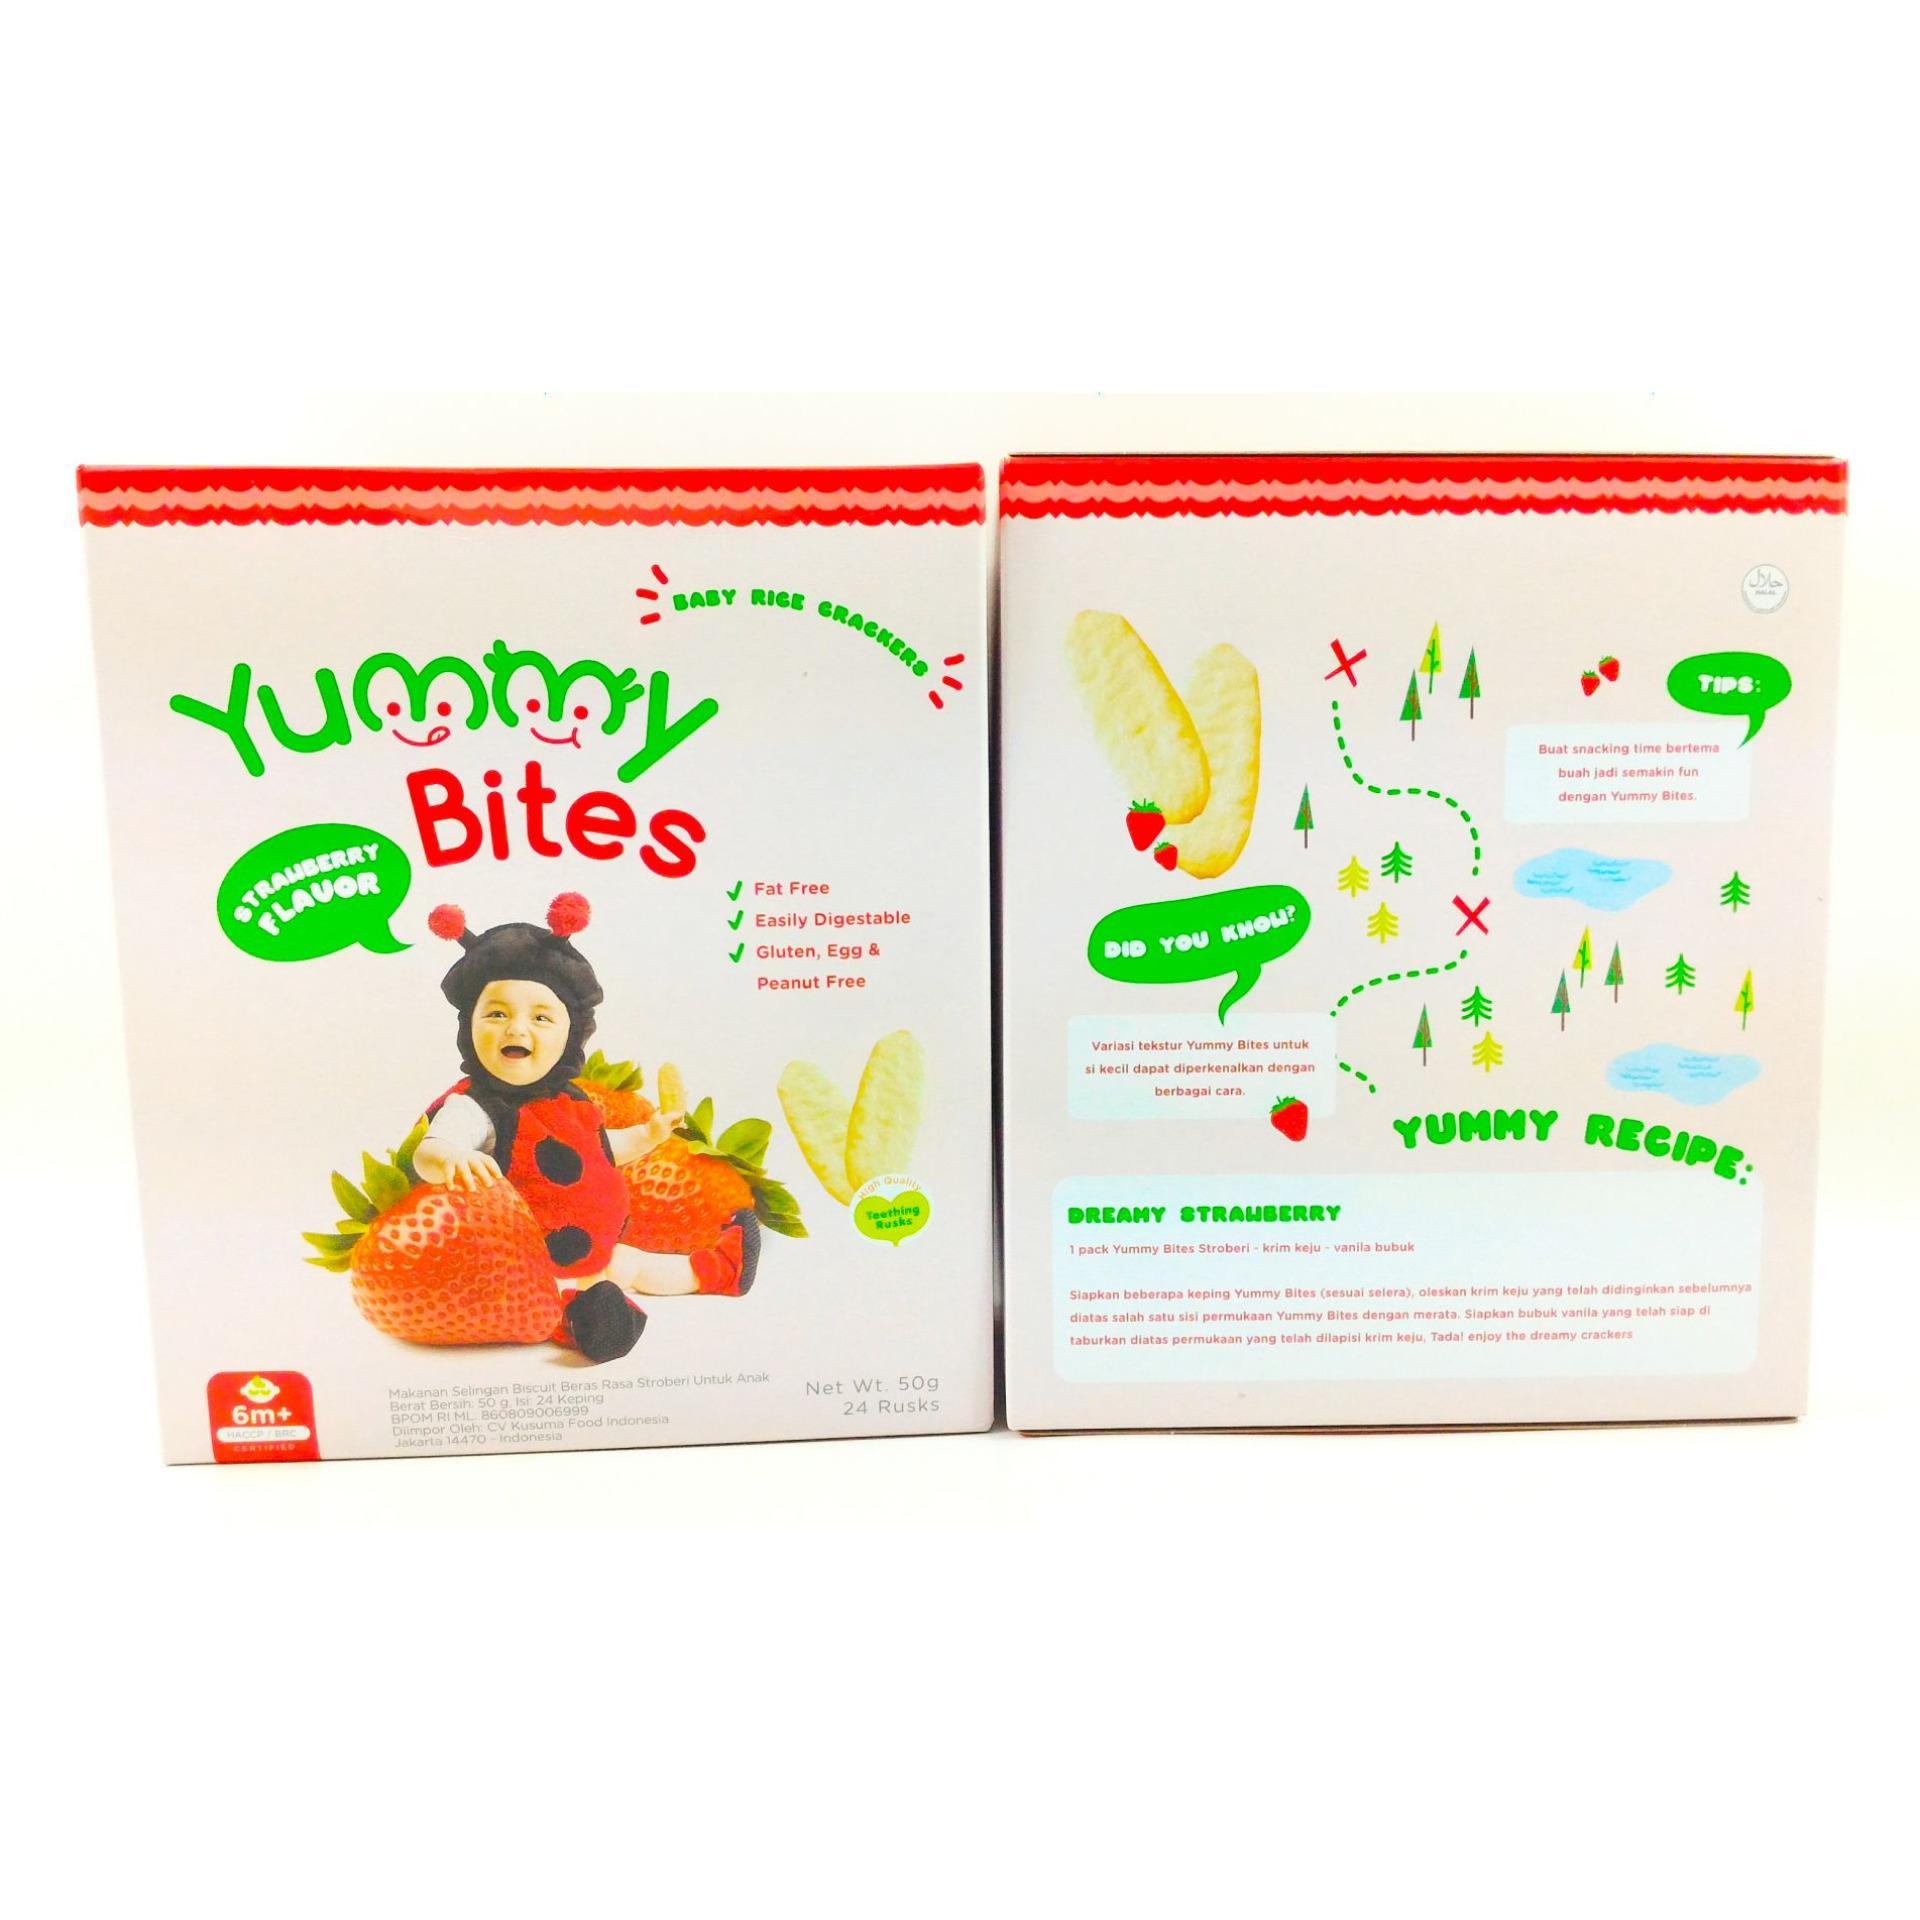 Yummy Bites Baby Rice Cracker 50 Gram Strawberry Daftar Harga 123 50gr Biskuit Bayi Snack Crackers Makanan Shock Price Gr Flavour